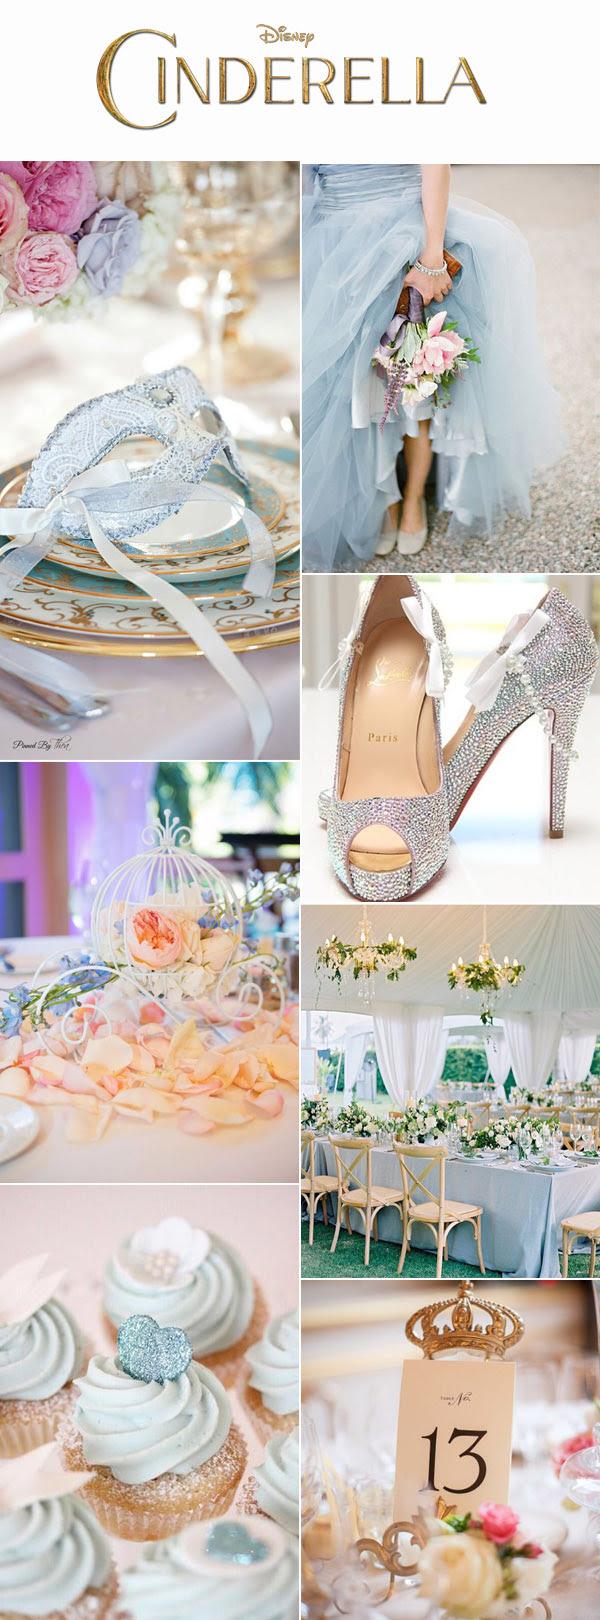 Fairytale Wedding Theme: Ideas to Make Your Wedding ...